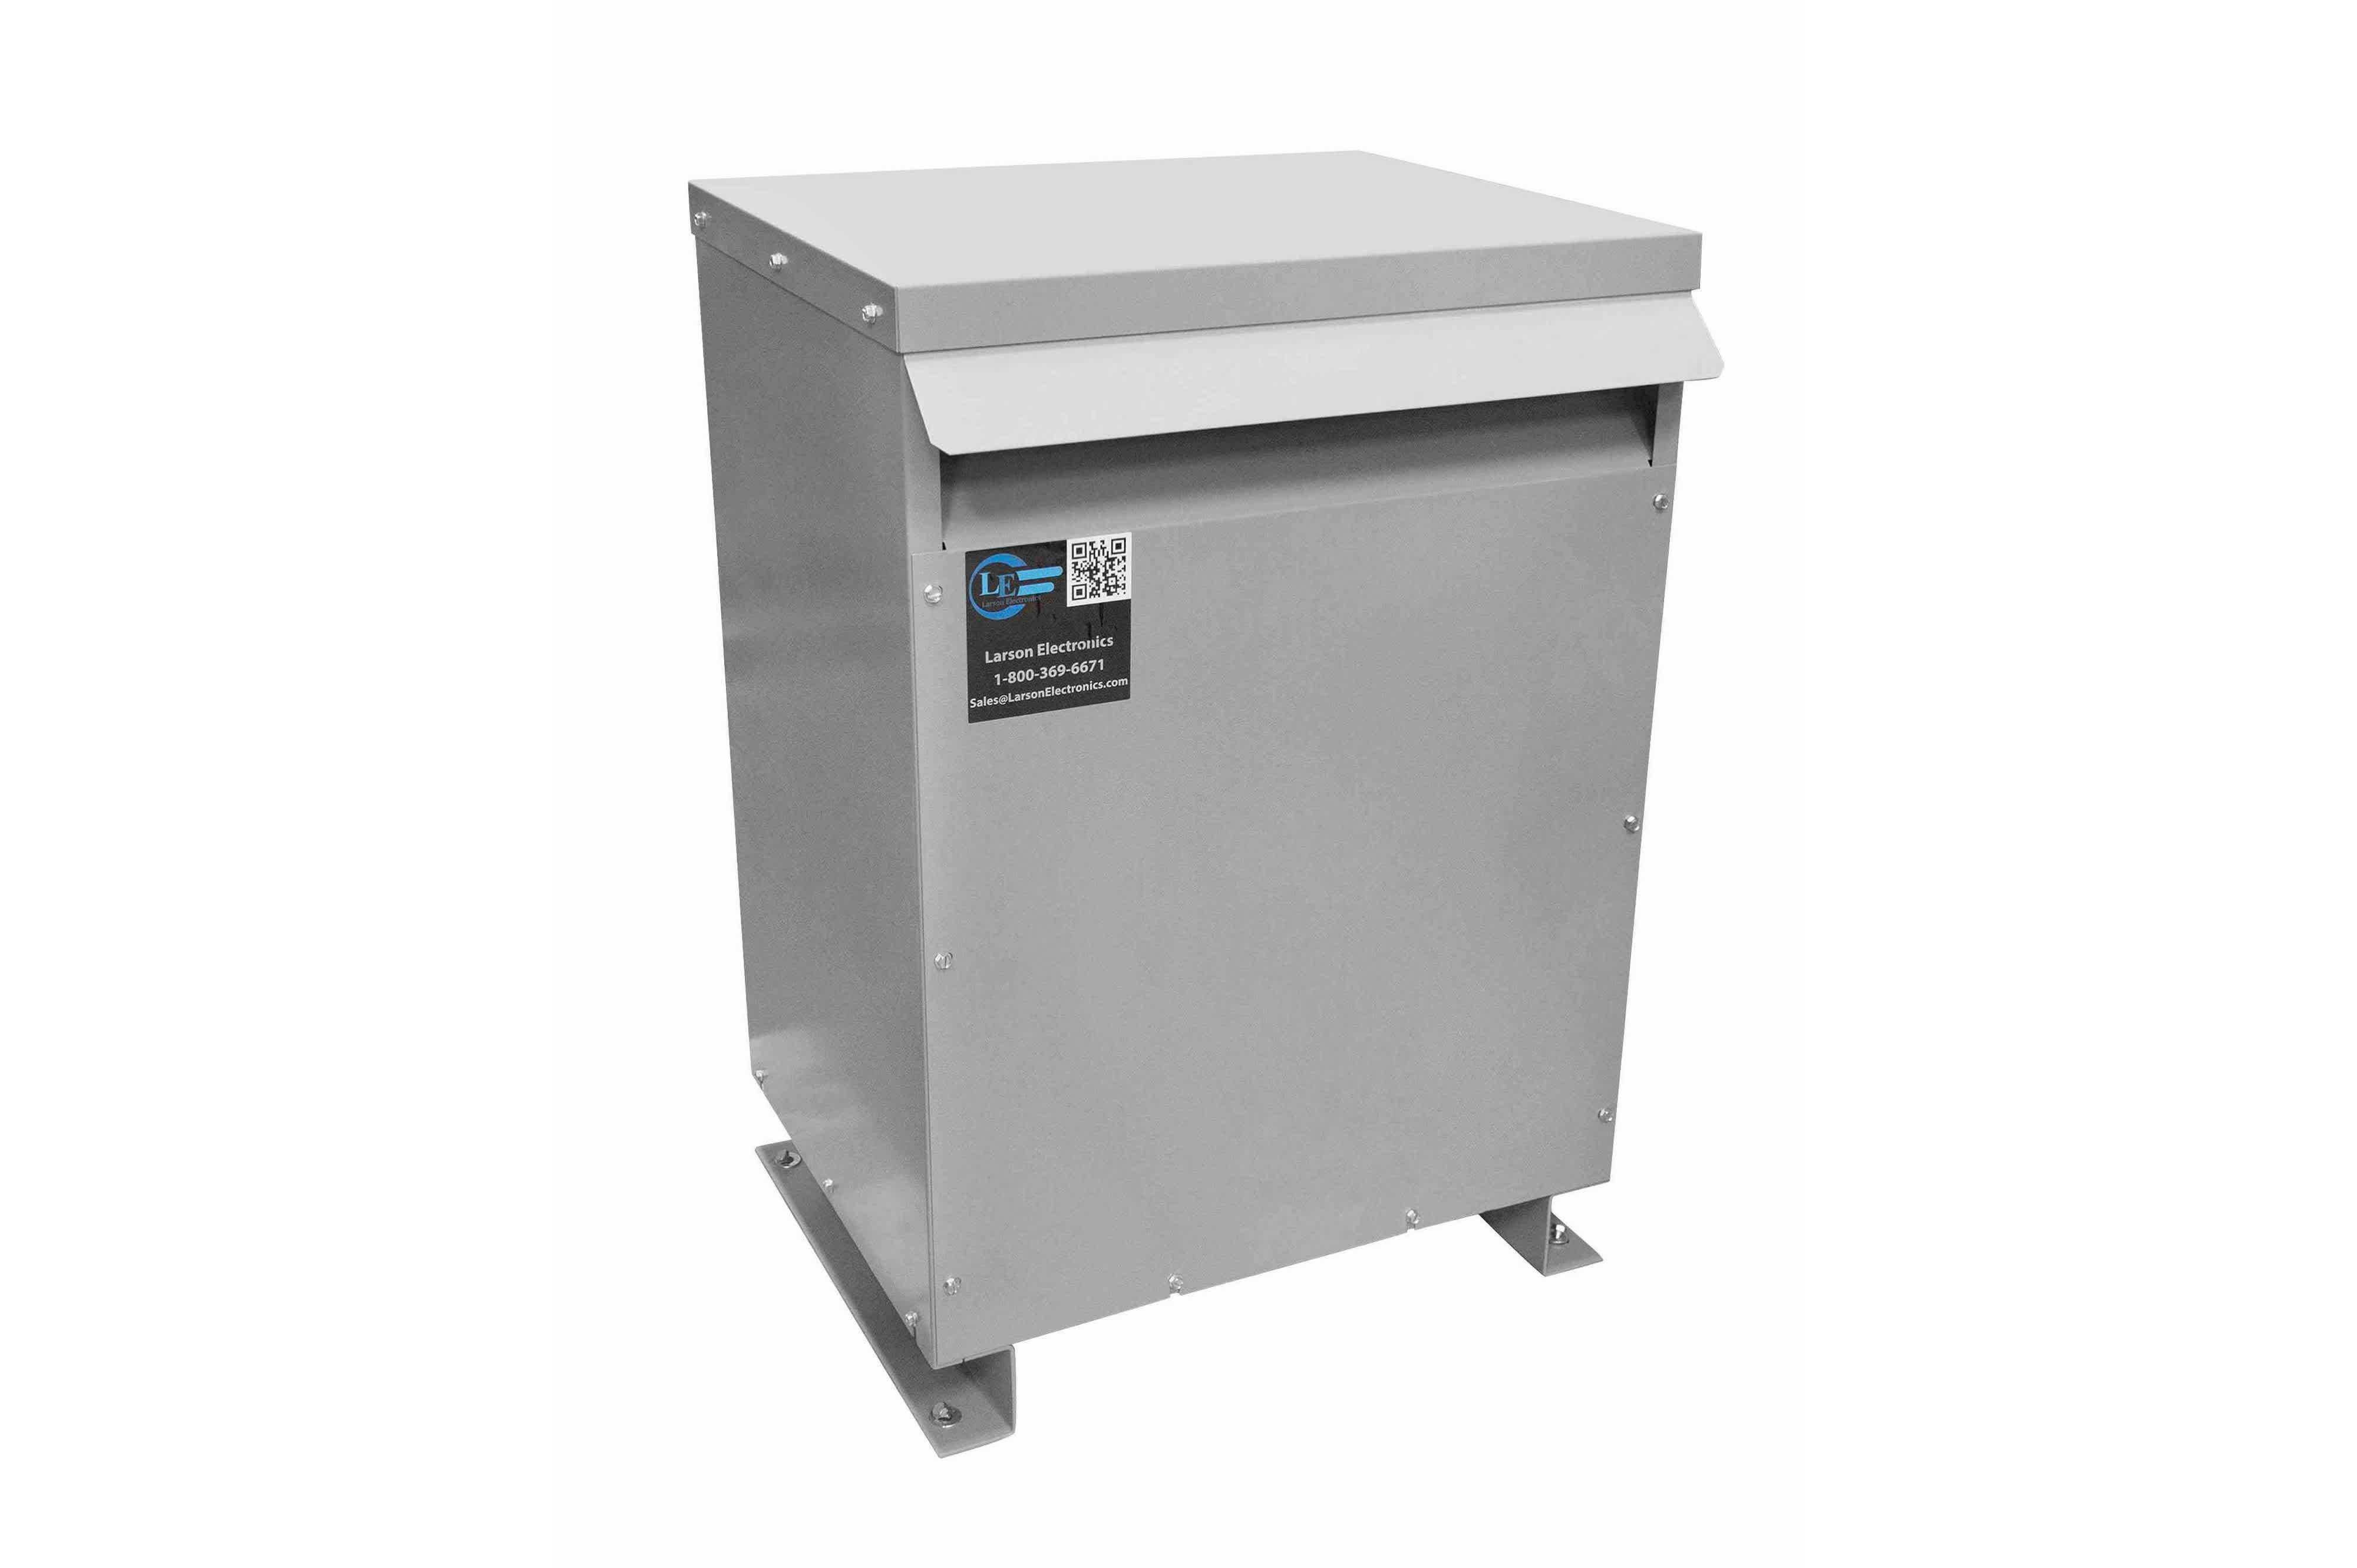 200 kVA 3PH Isolation Transformer, 400V Wye Primary, 208V Delta Secondary, N3R, Ventilated, 60 Hz